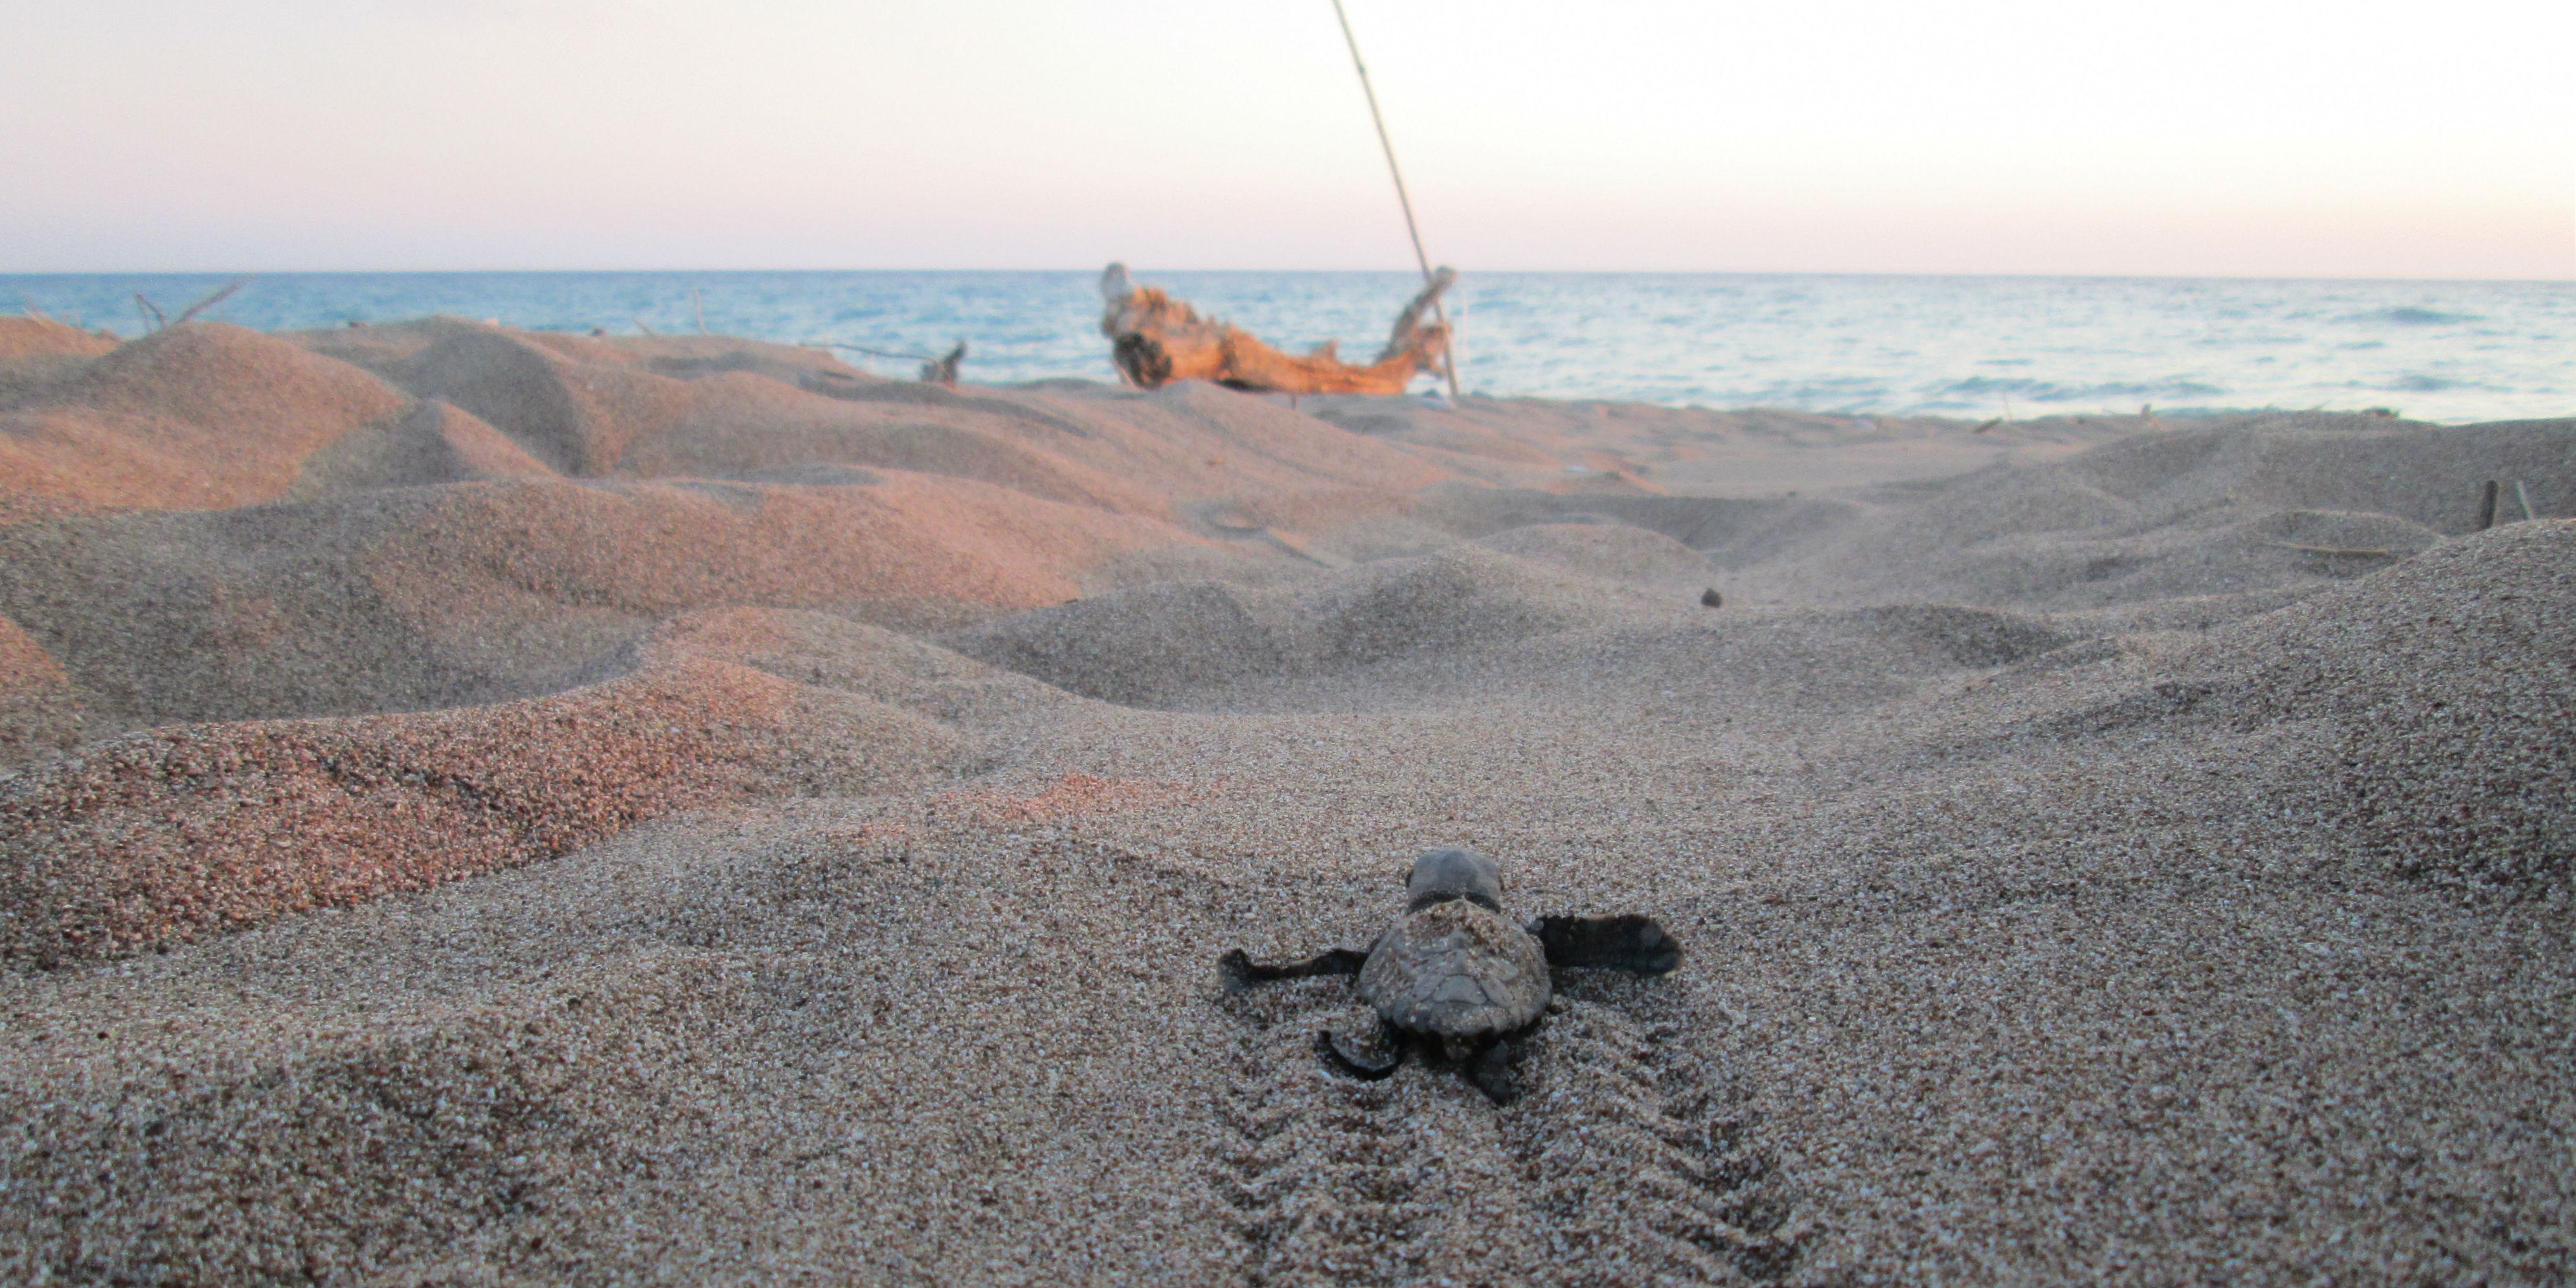 turtle hatch-lings